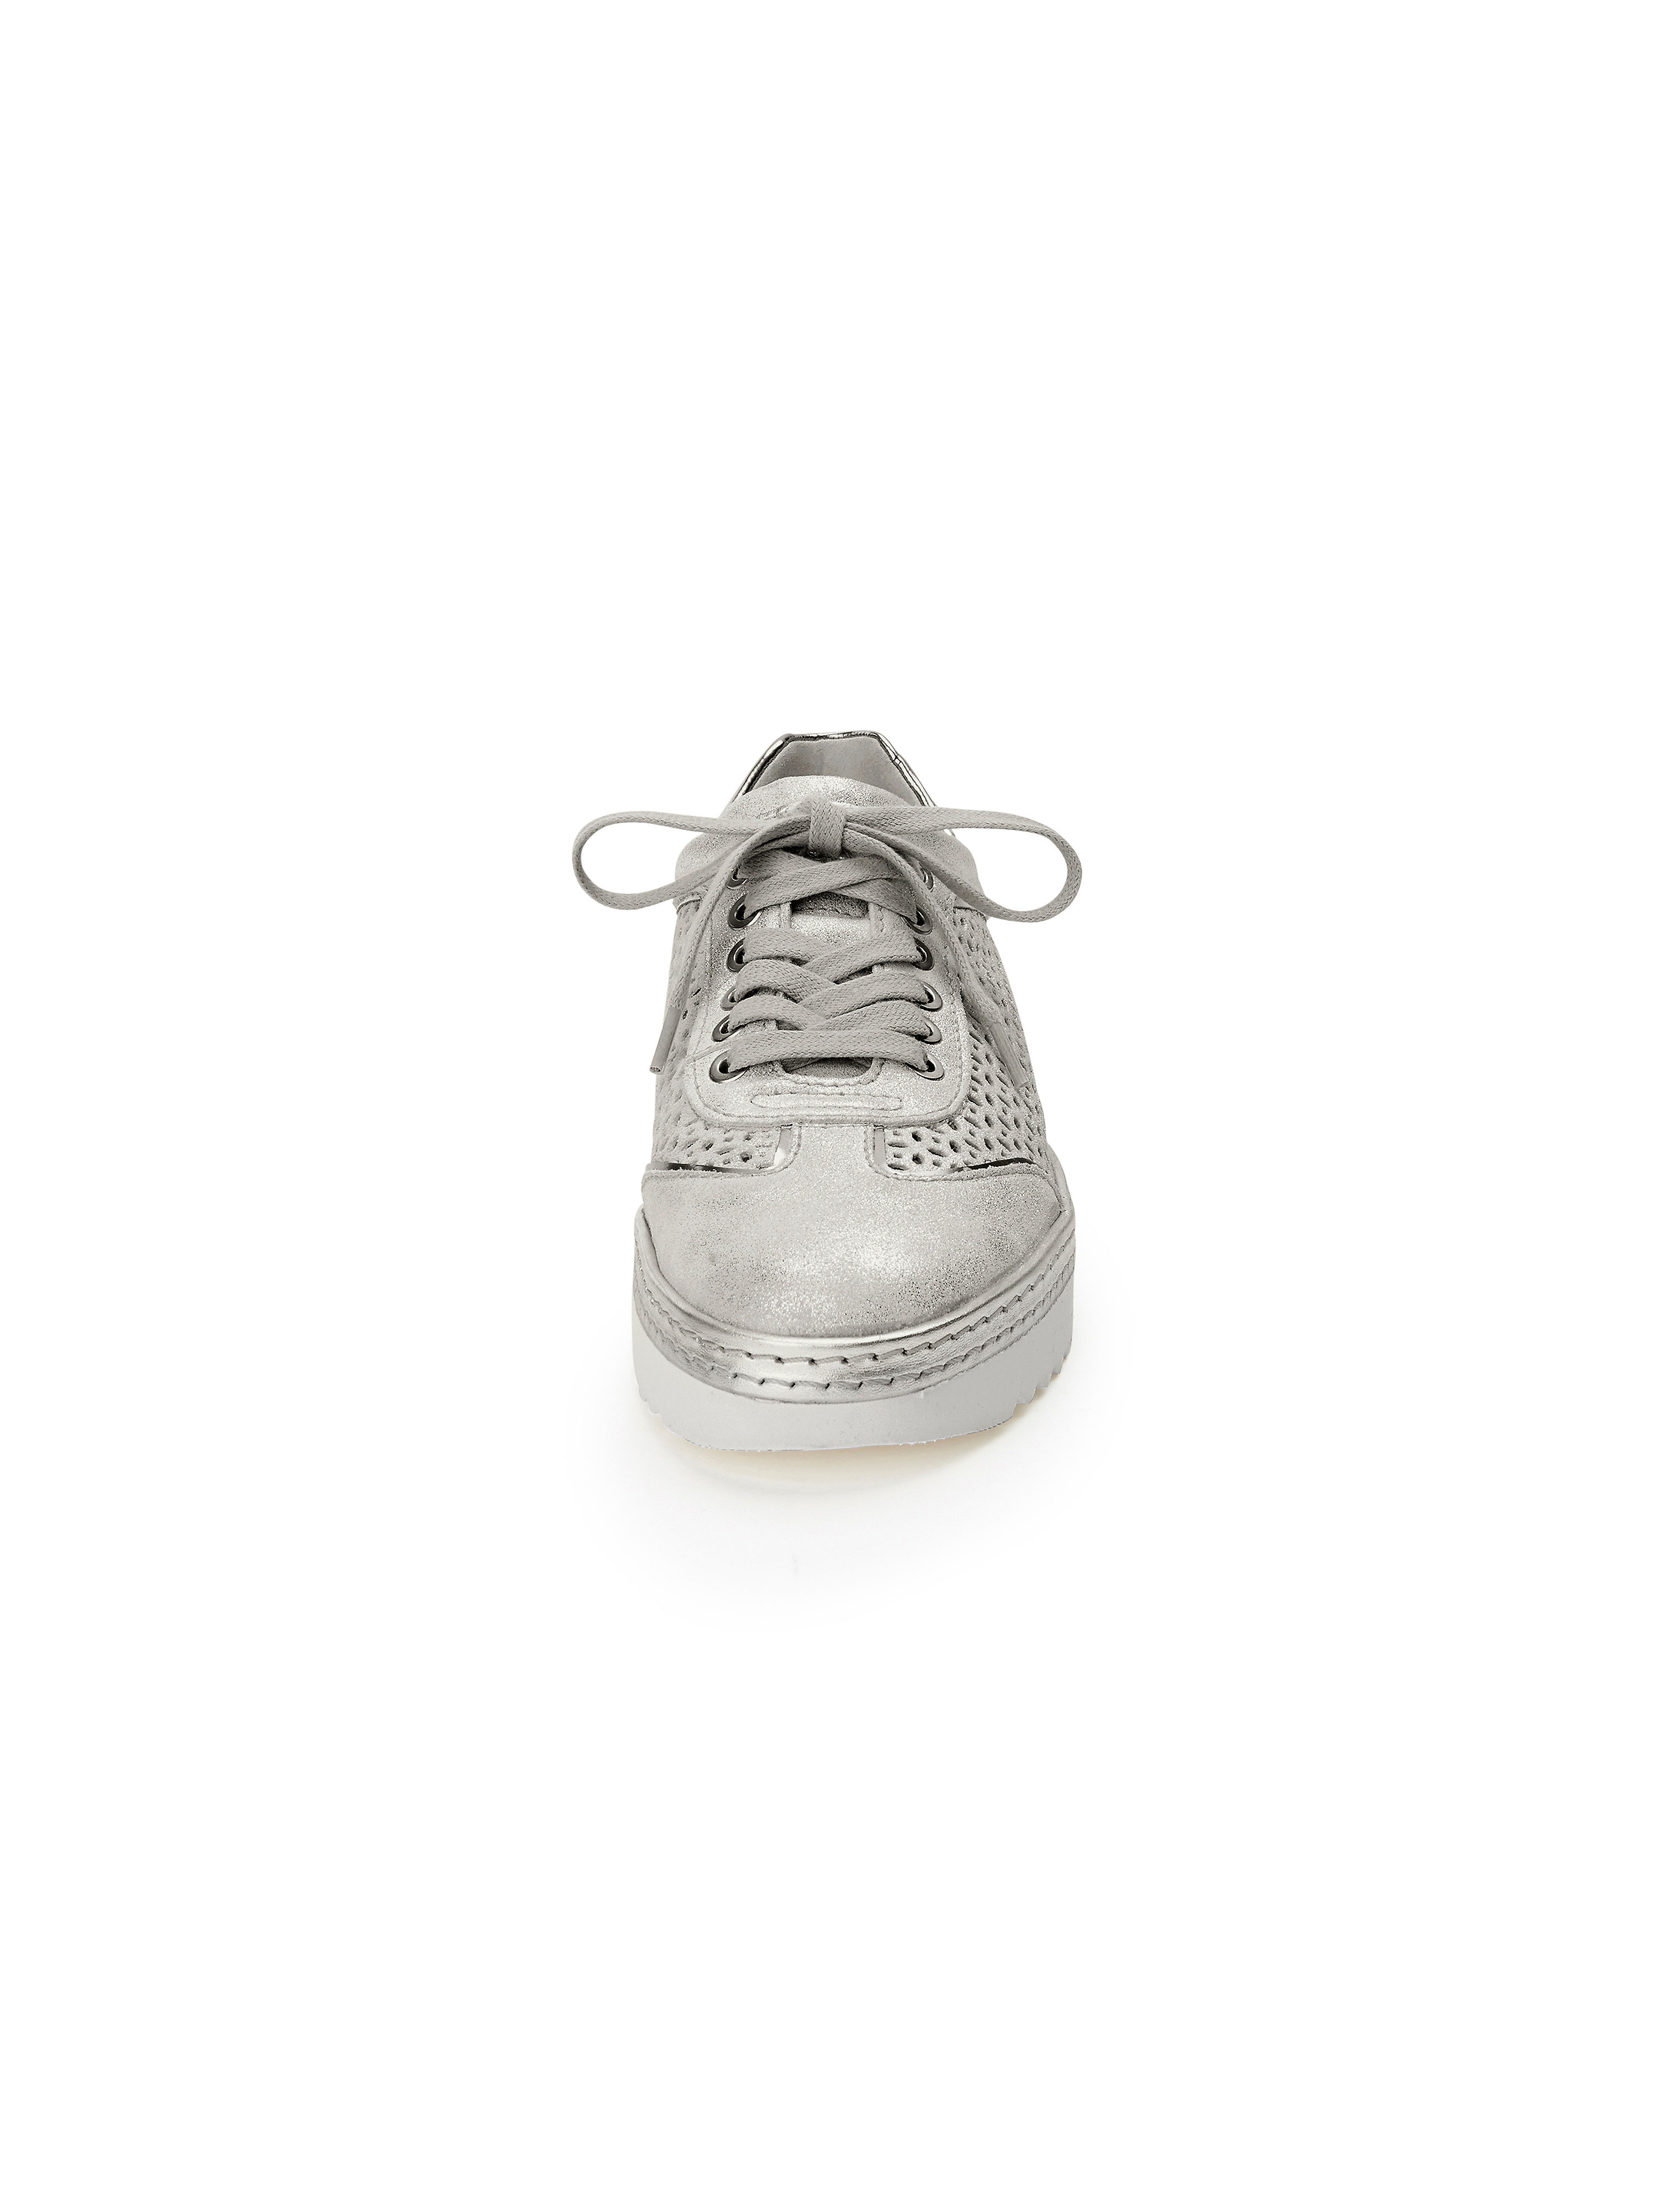 Sioux - Sneaker Oxiria aus 100% Qualität Leder - Silber-Metallic Gute Qualität 100% beliebte Schuhe 614953